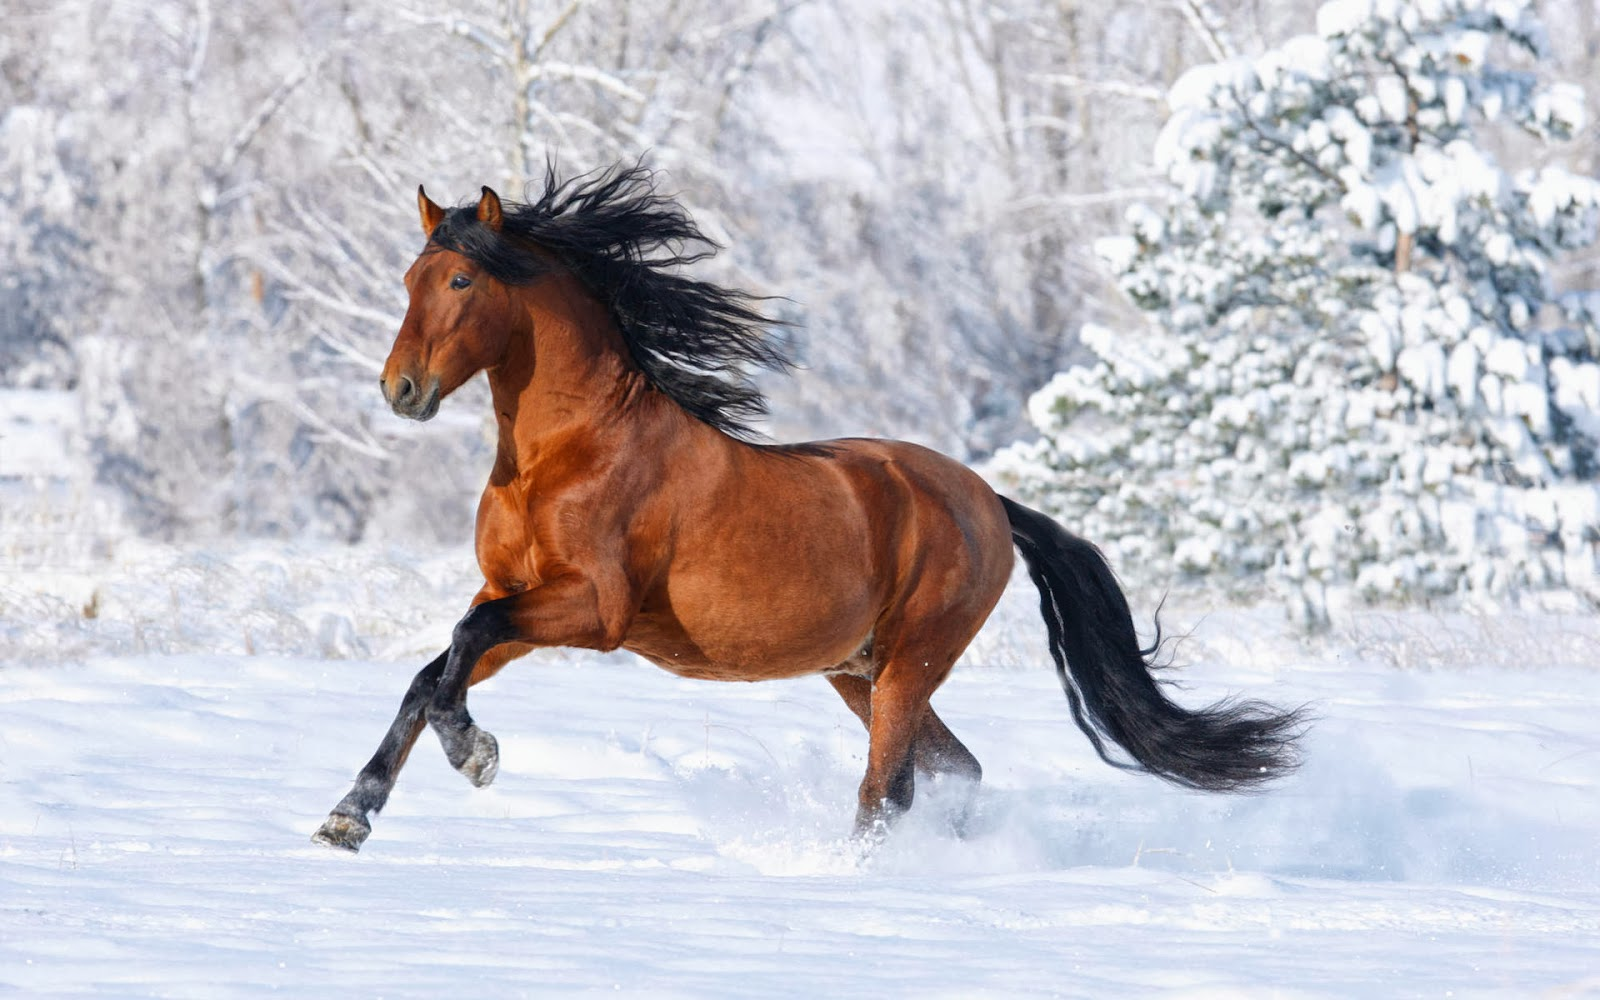 HD Wallpapers Desktop: Horses HD Wallpapers